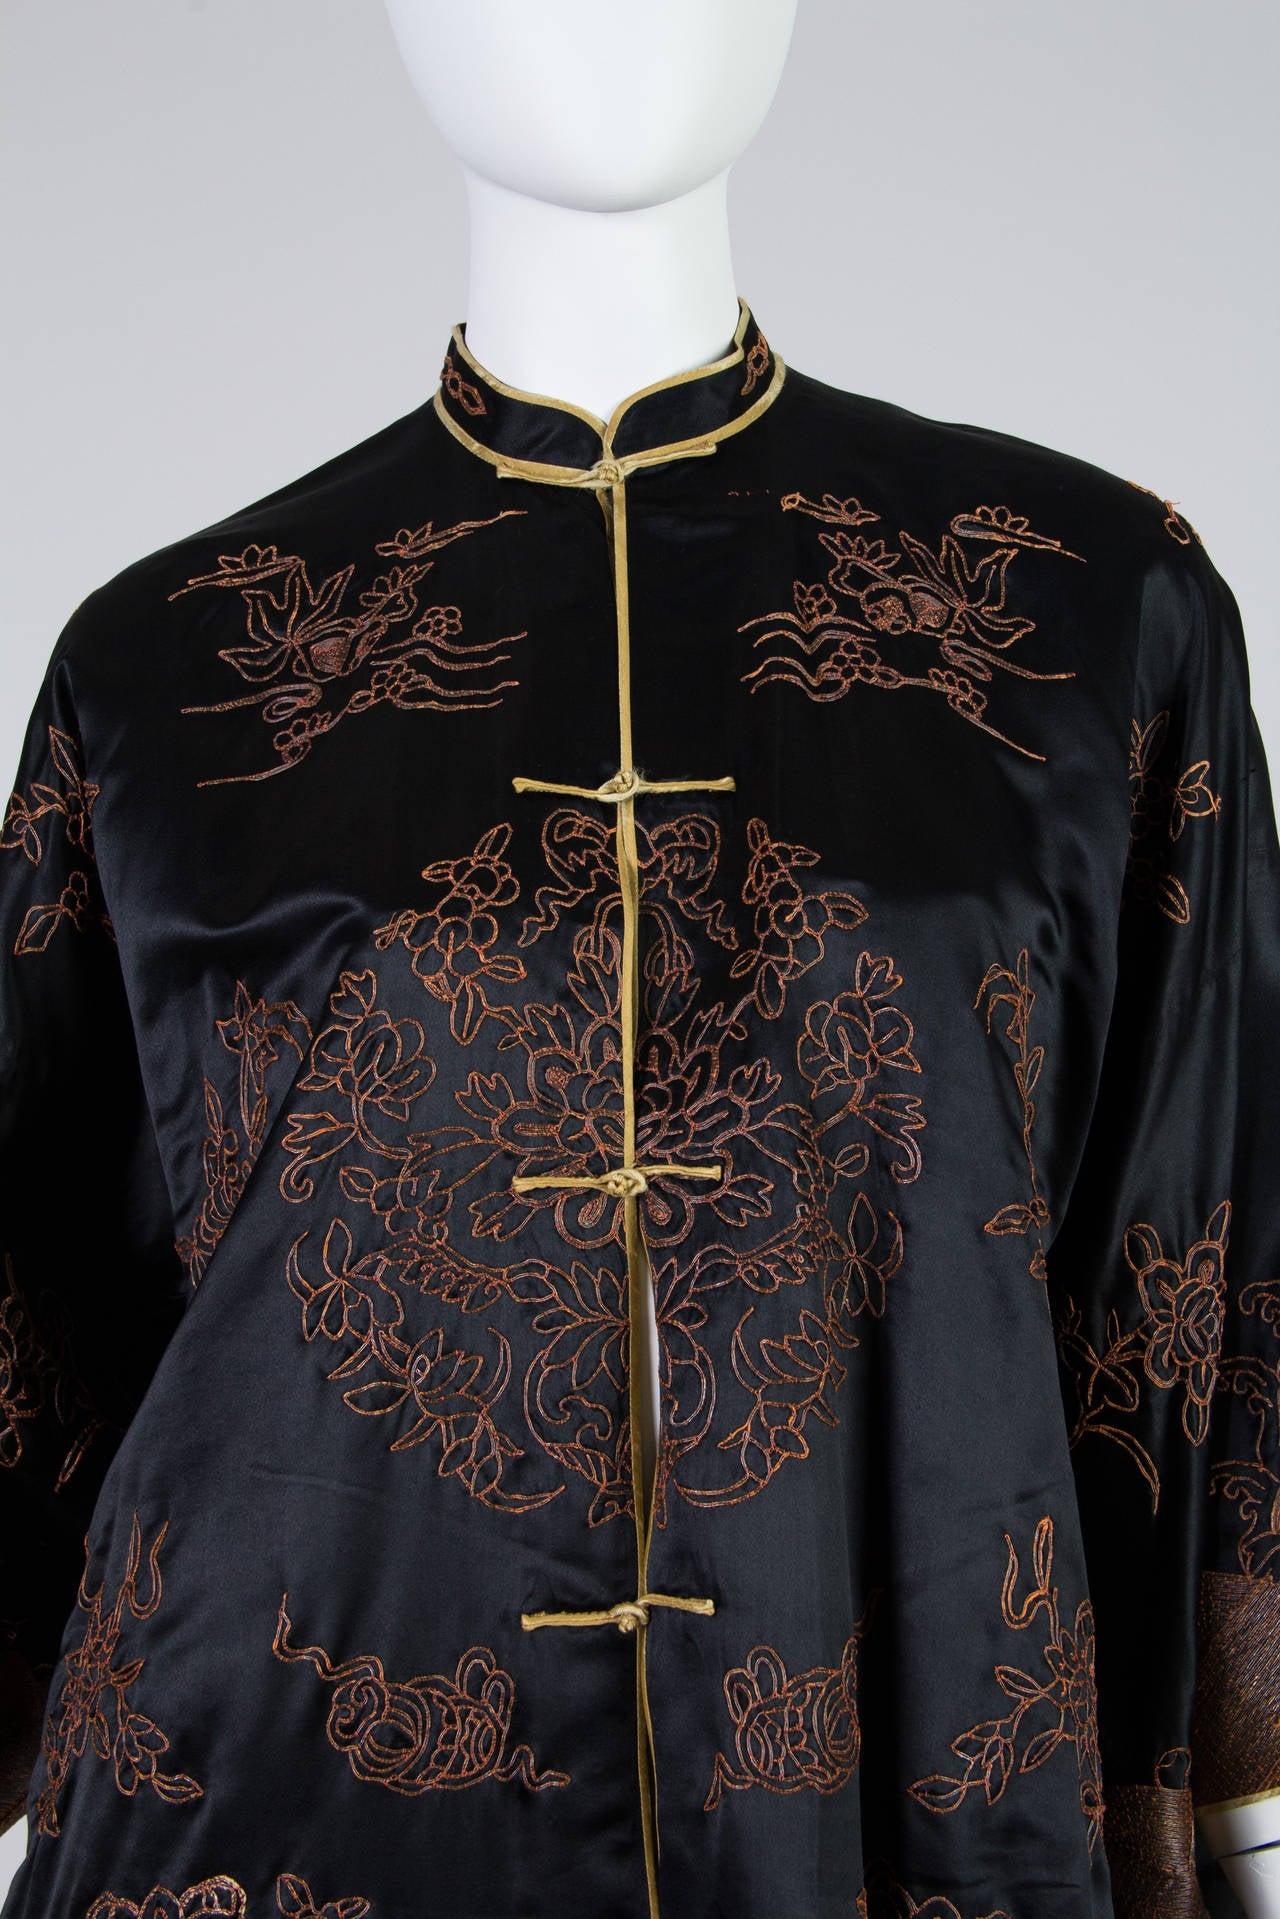 Early Chinese Embroidered Jacket Kimono style 5